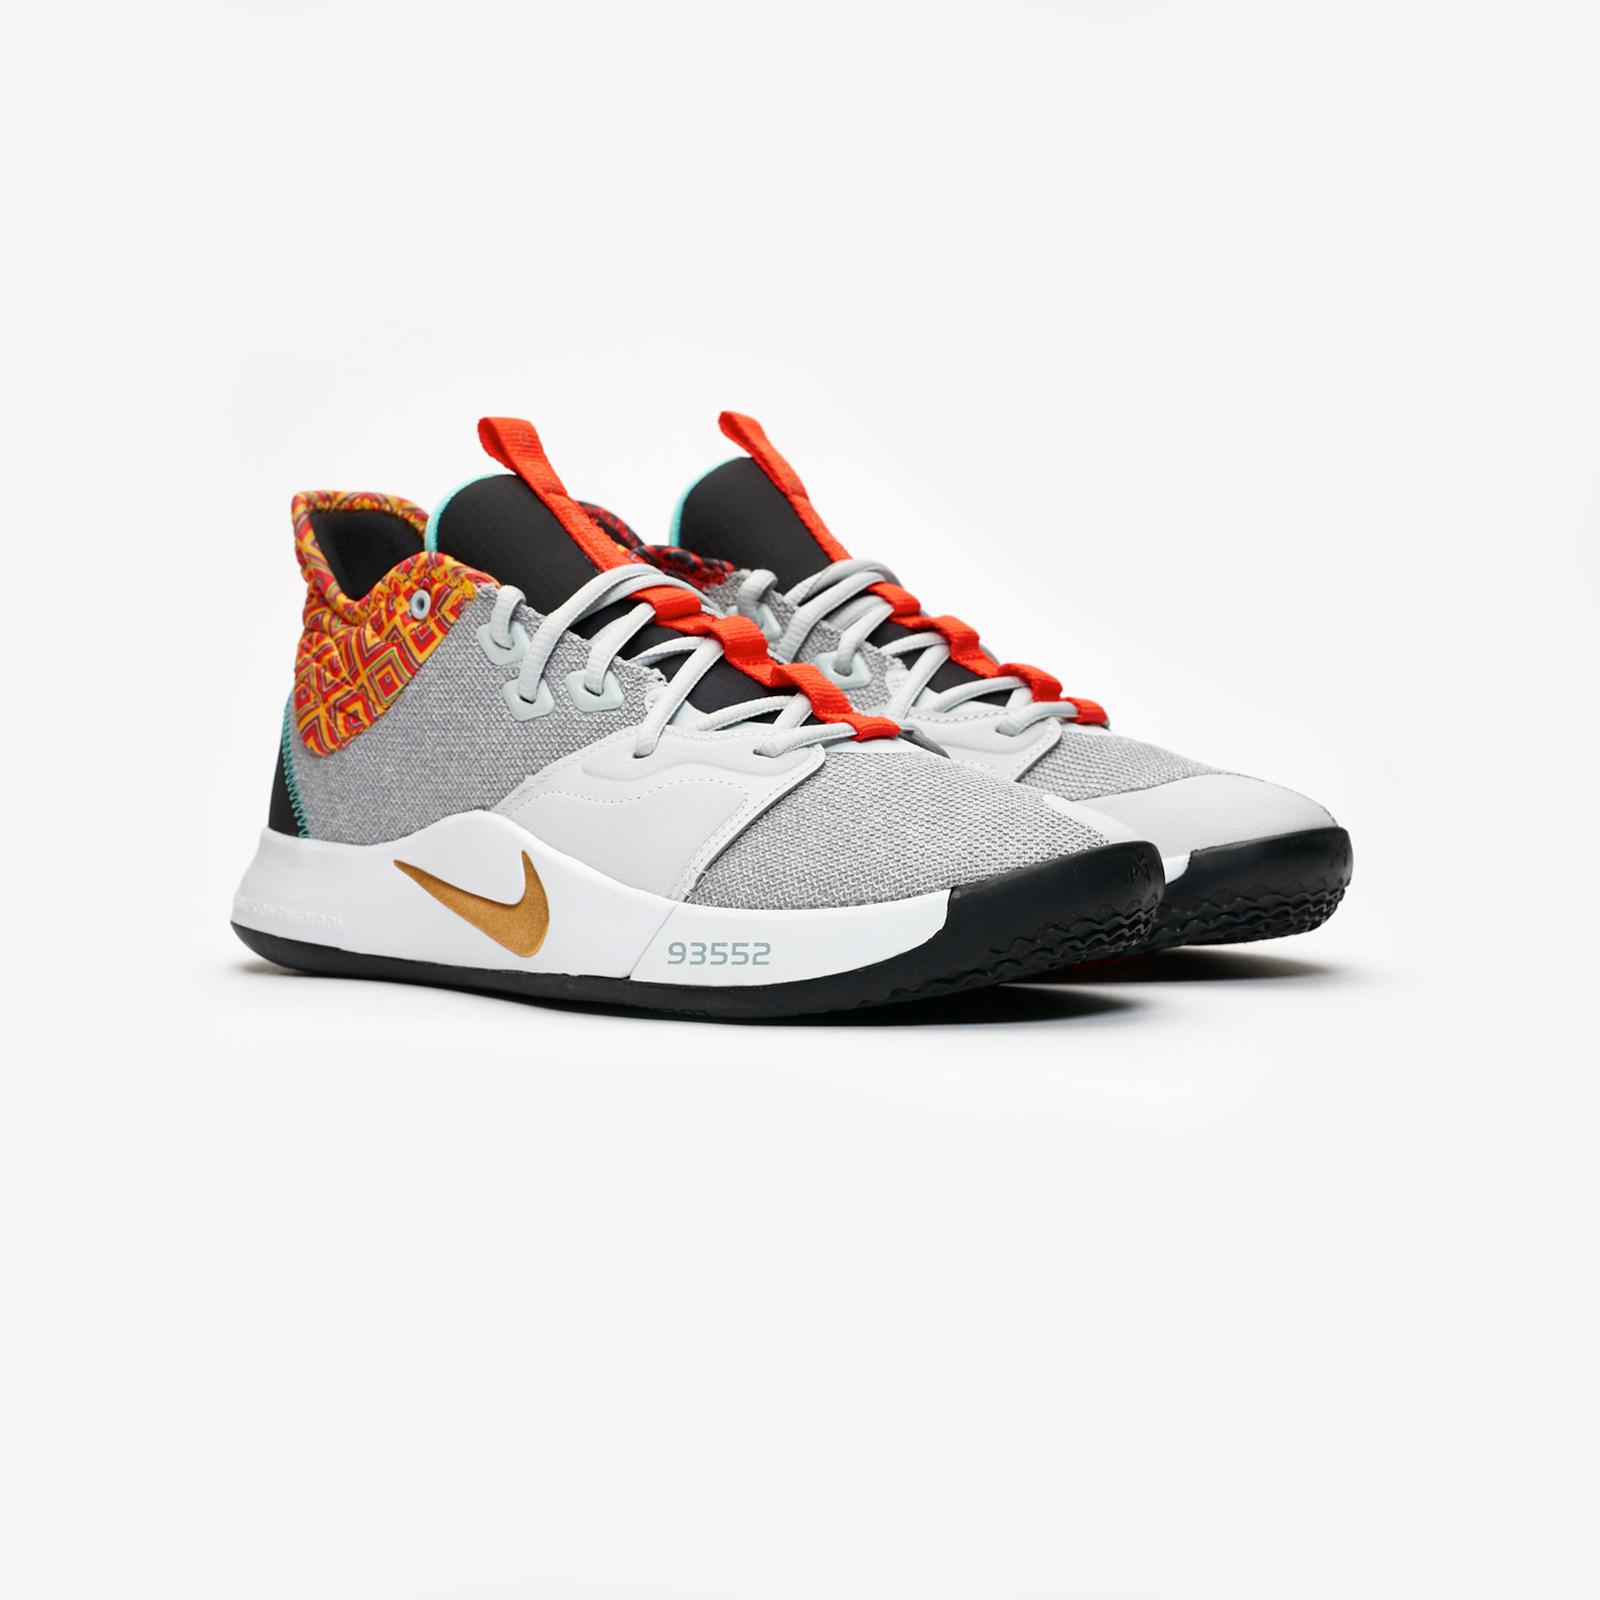 Nike PG 3 BHM - Bq6242-007 - Sneakersnstuff | sneakers & streetwear ...